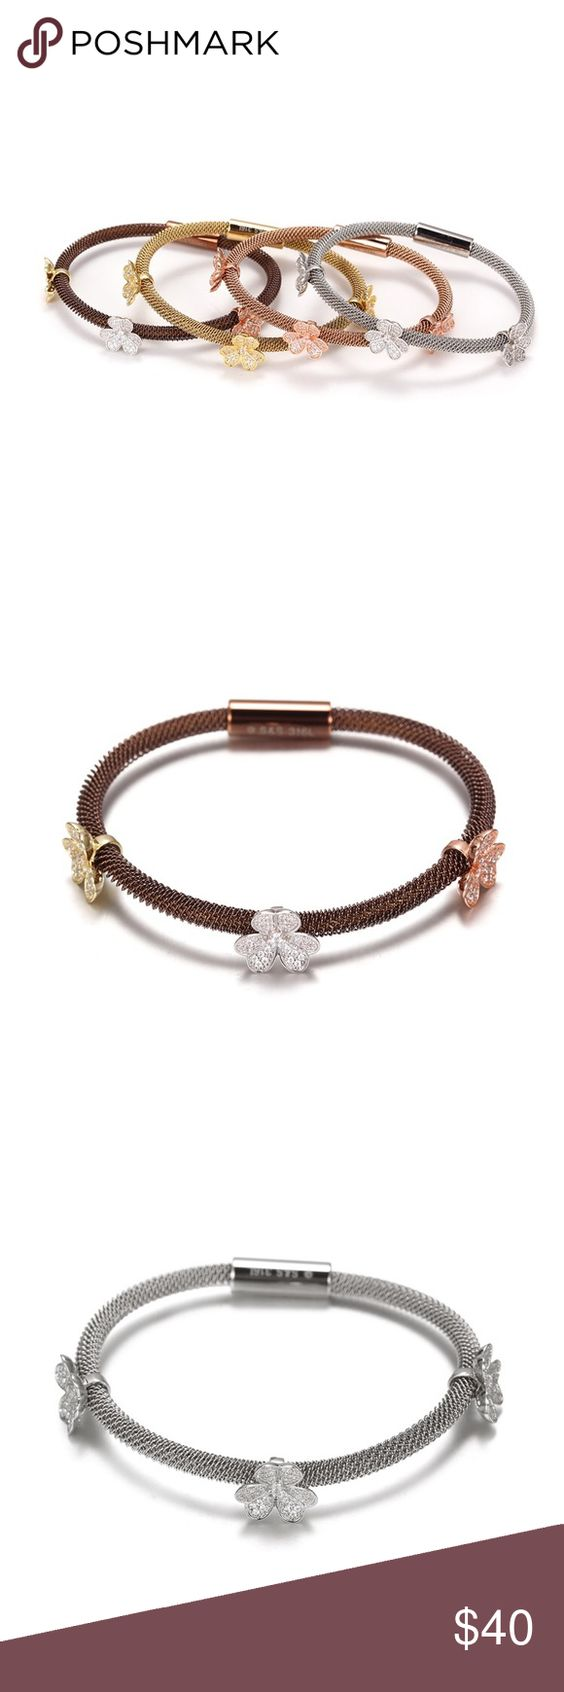 Bracelet Designer inspired bracelet Jewelry Bracelets